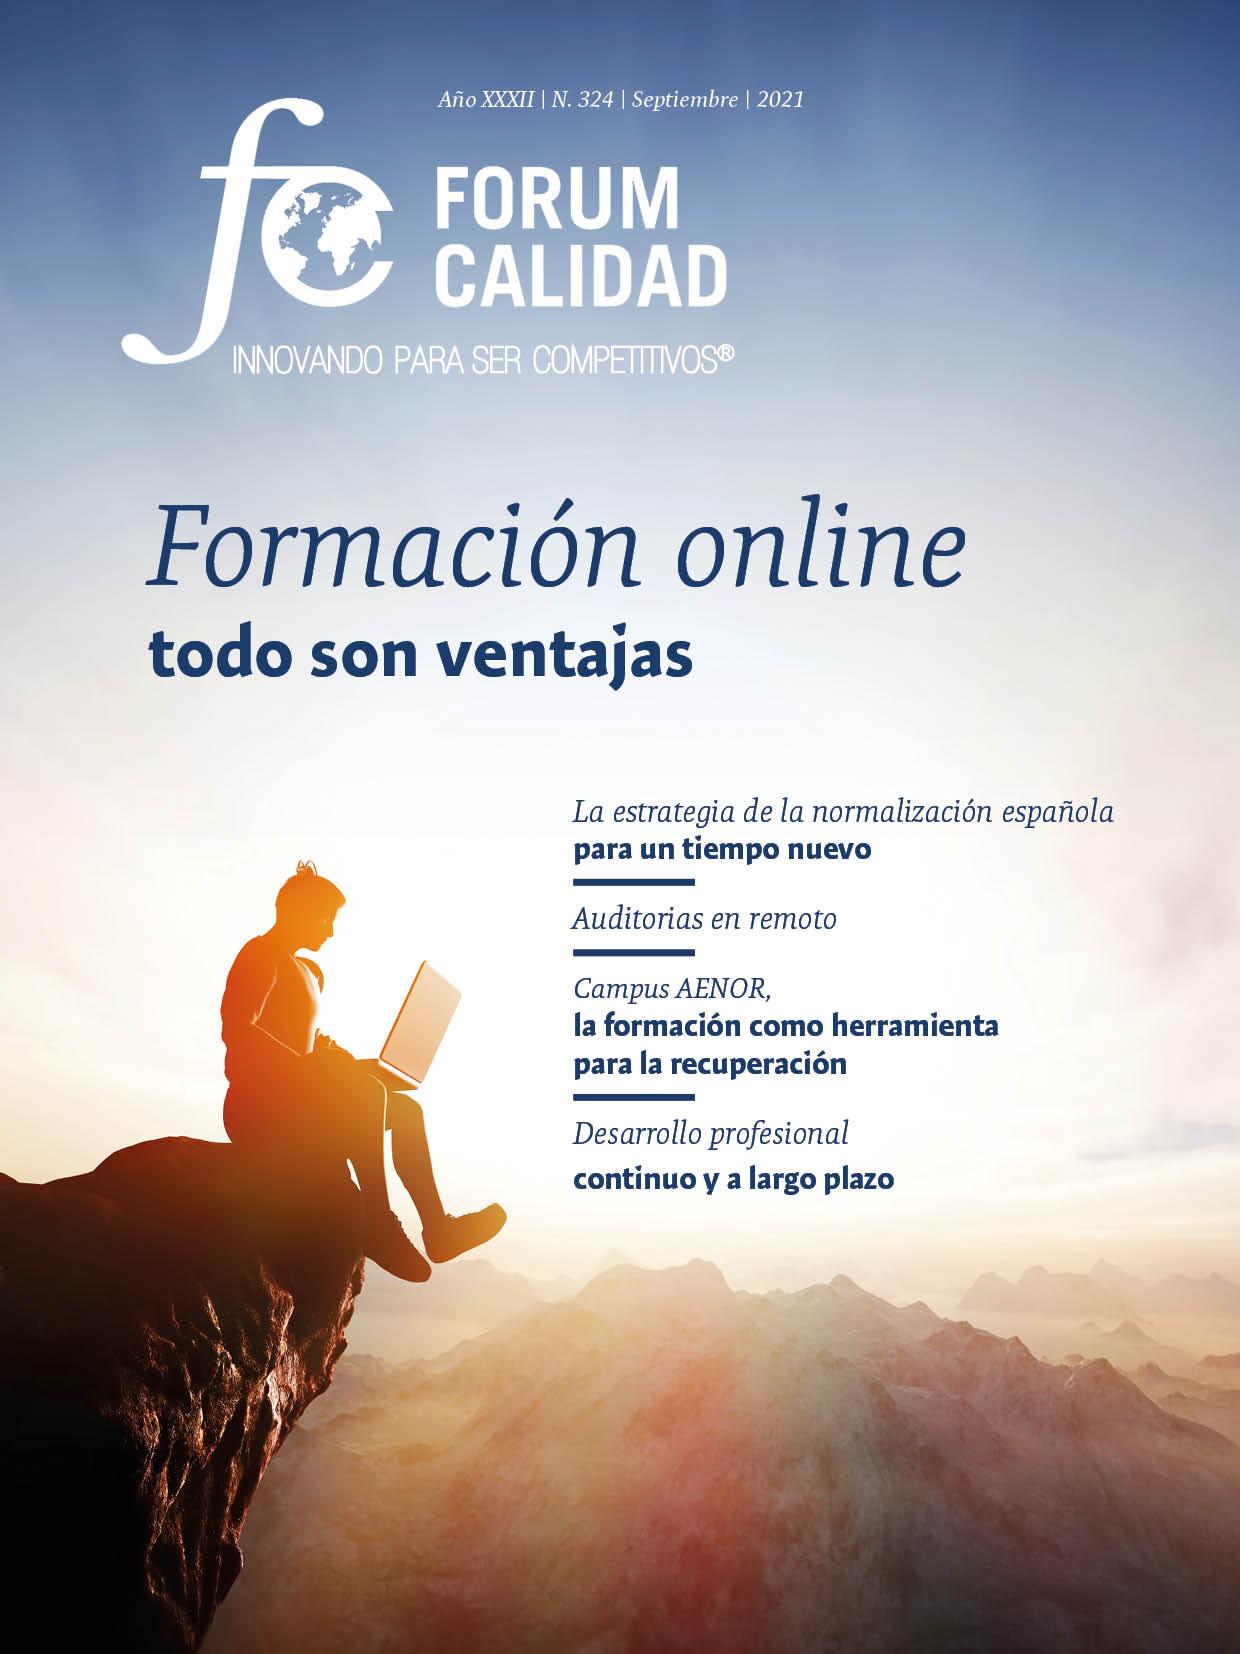 Forum Calidad nº 324 Septiembre 2021